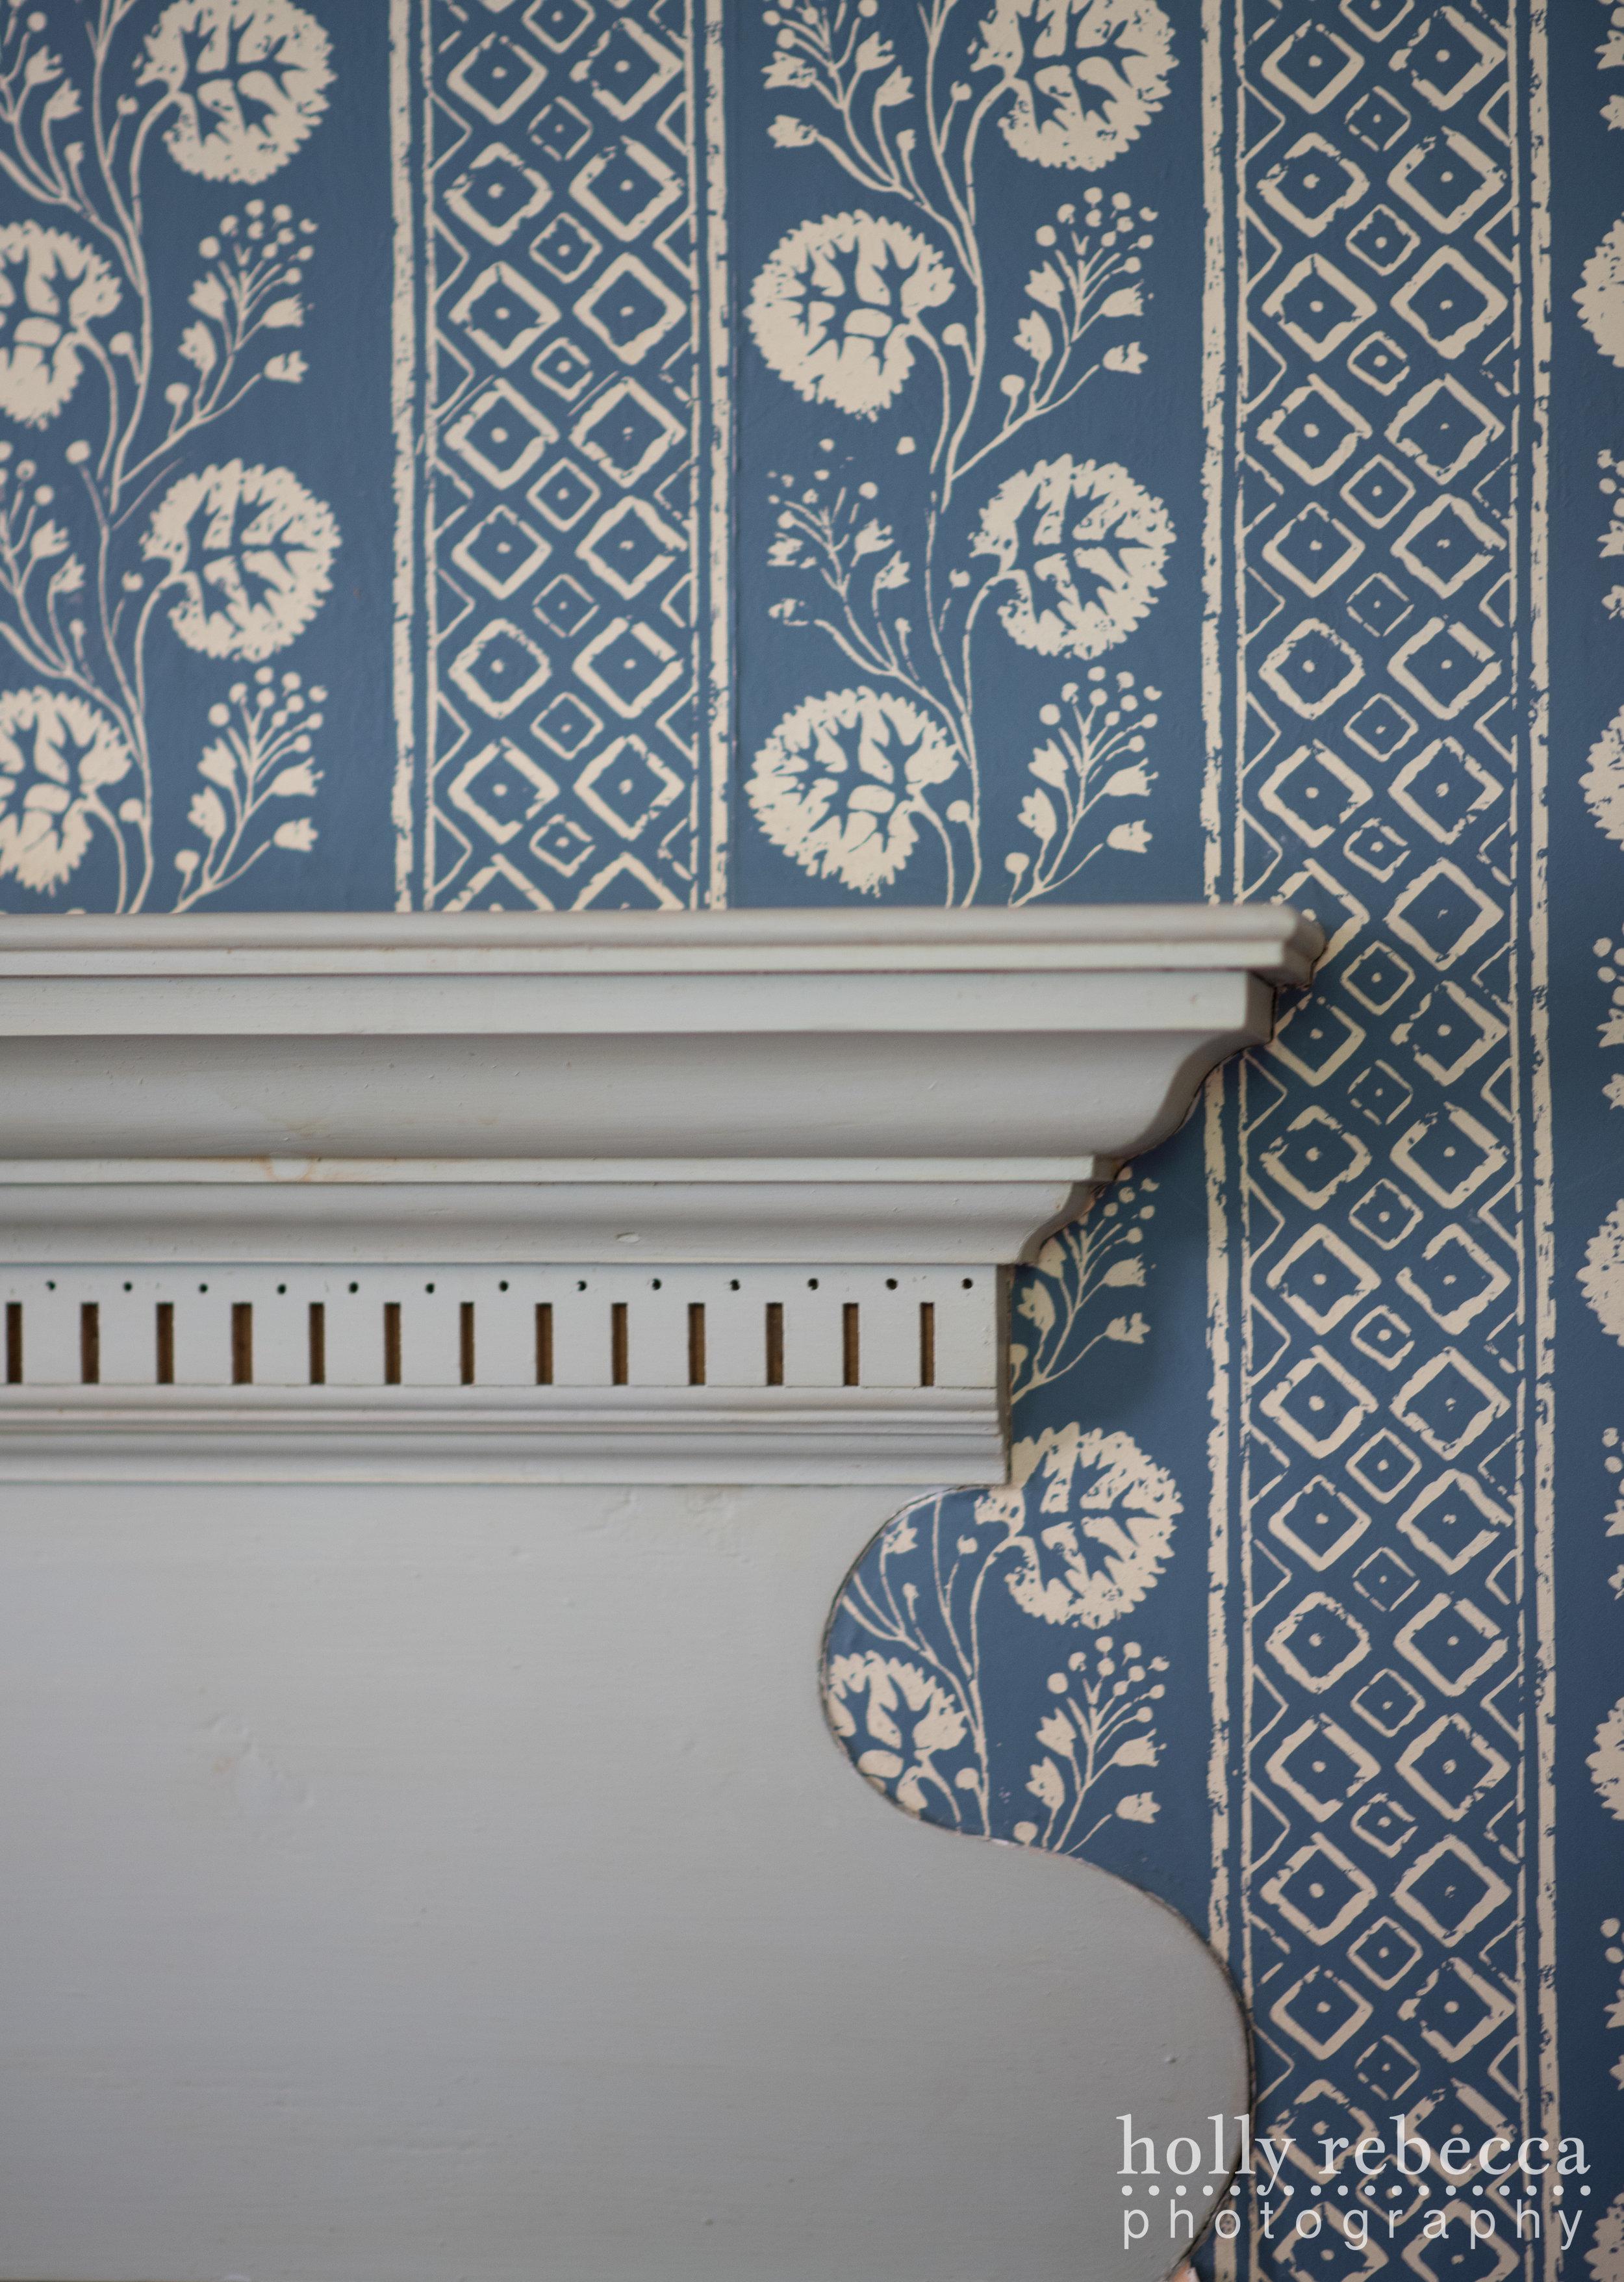 Shapley- Drisco House 1795